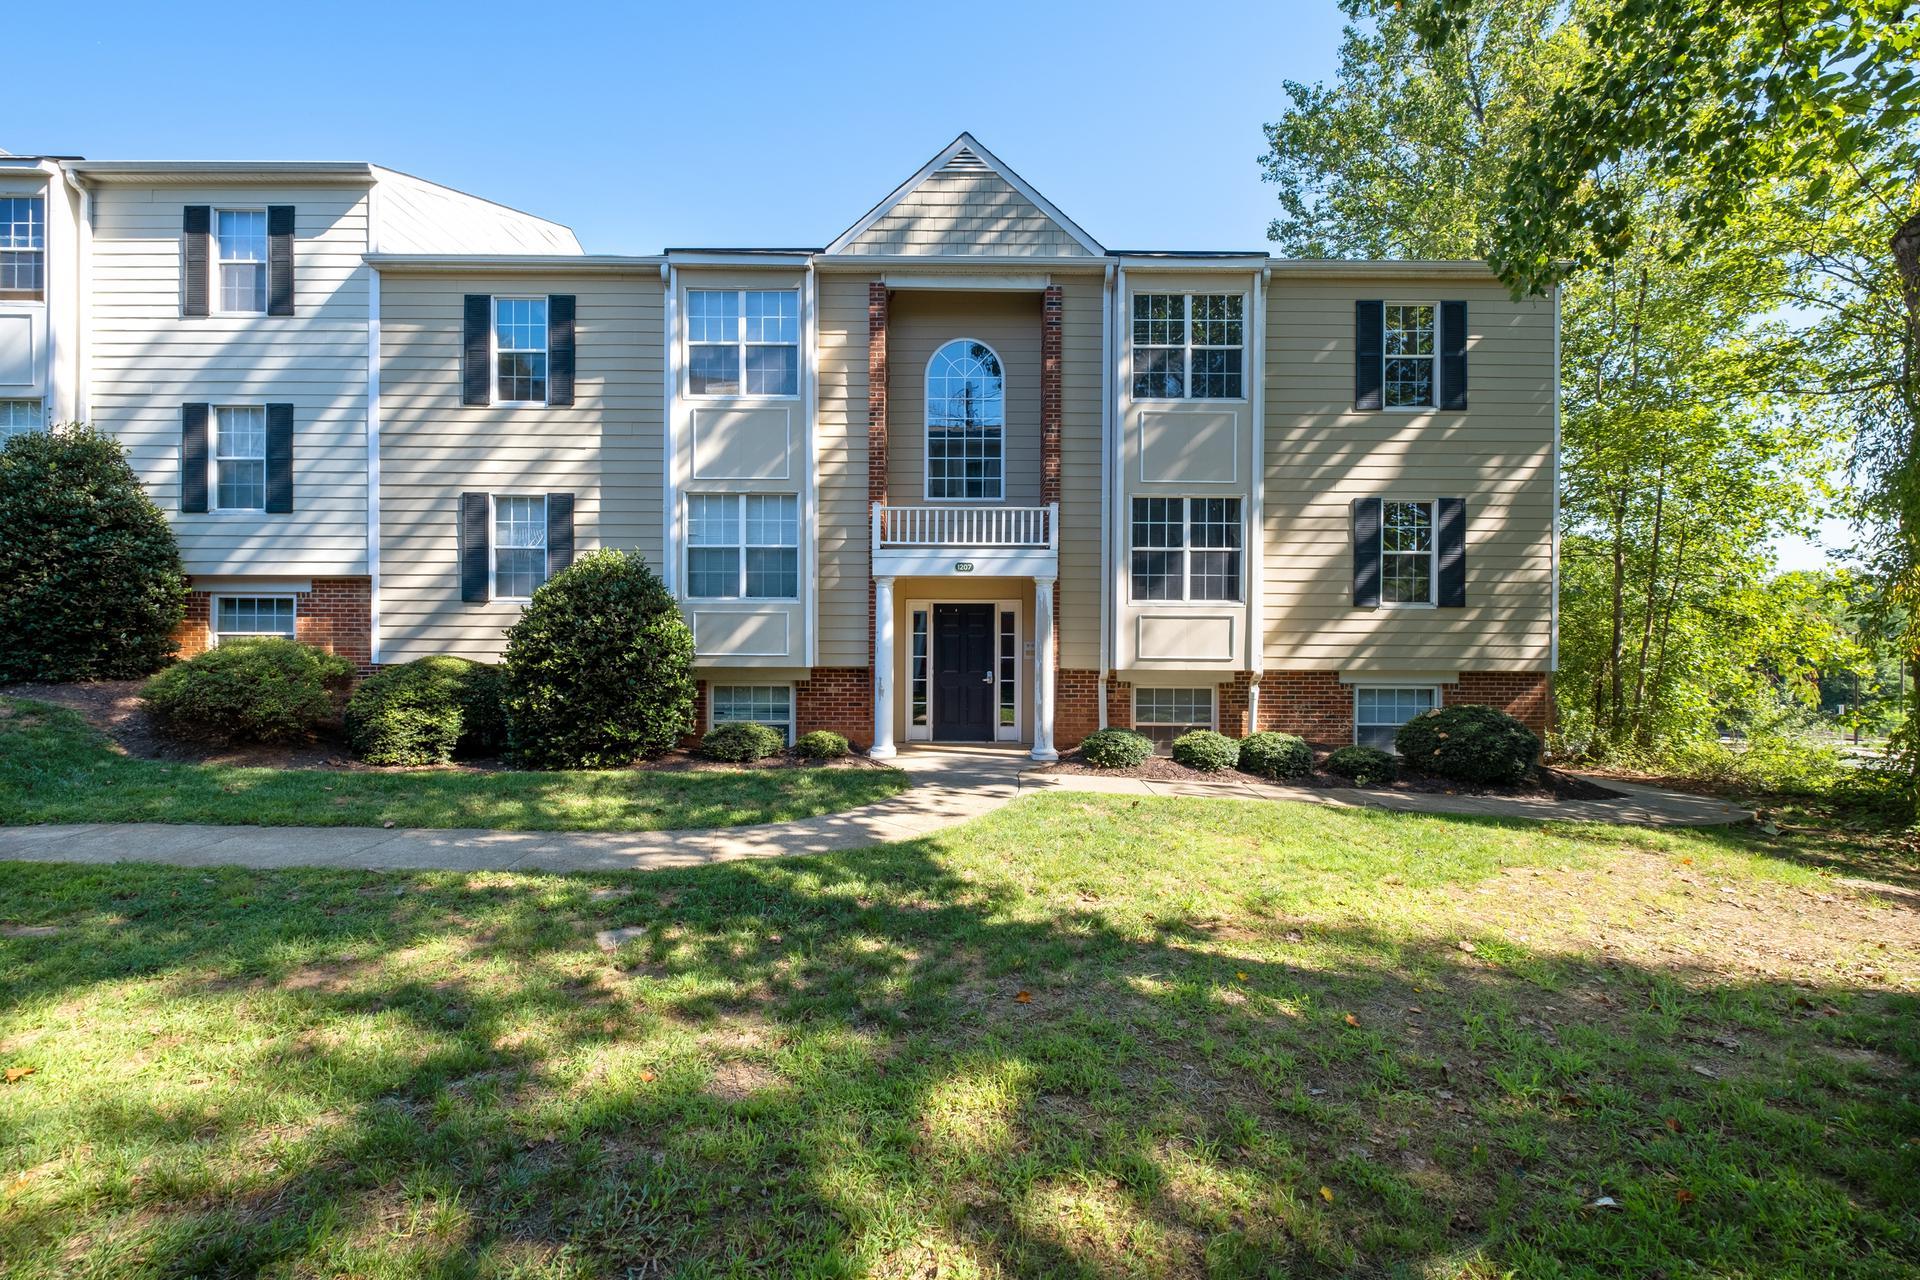 1207 Villa Ln, Unit F, Charlottesville, VA 22903